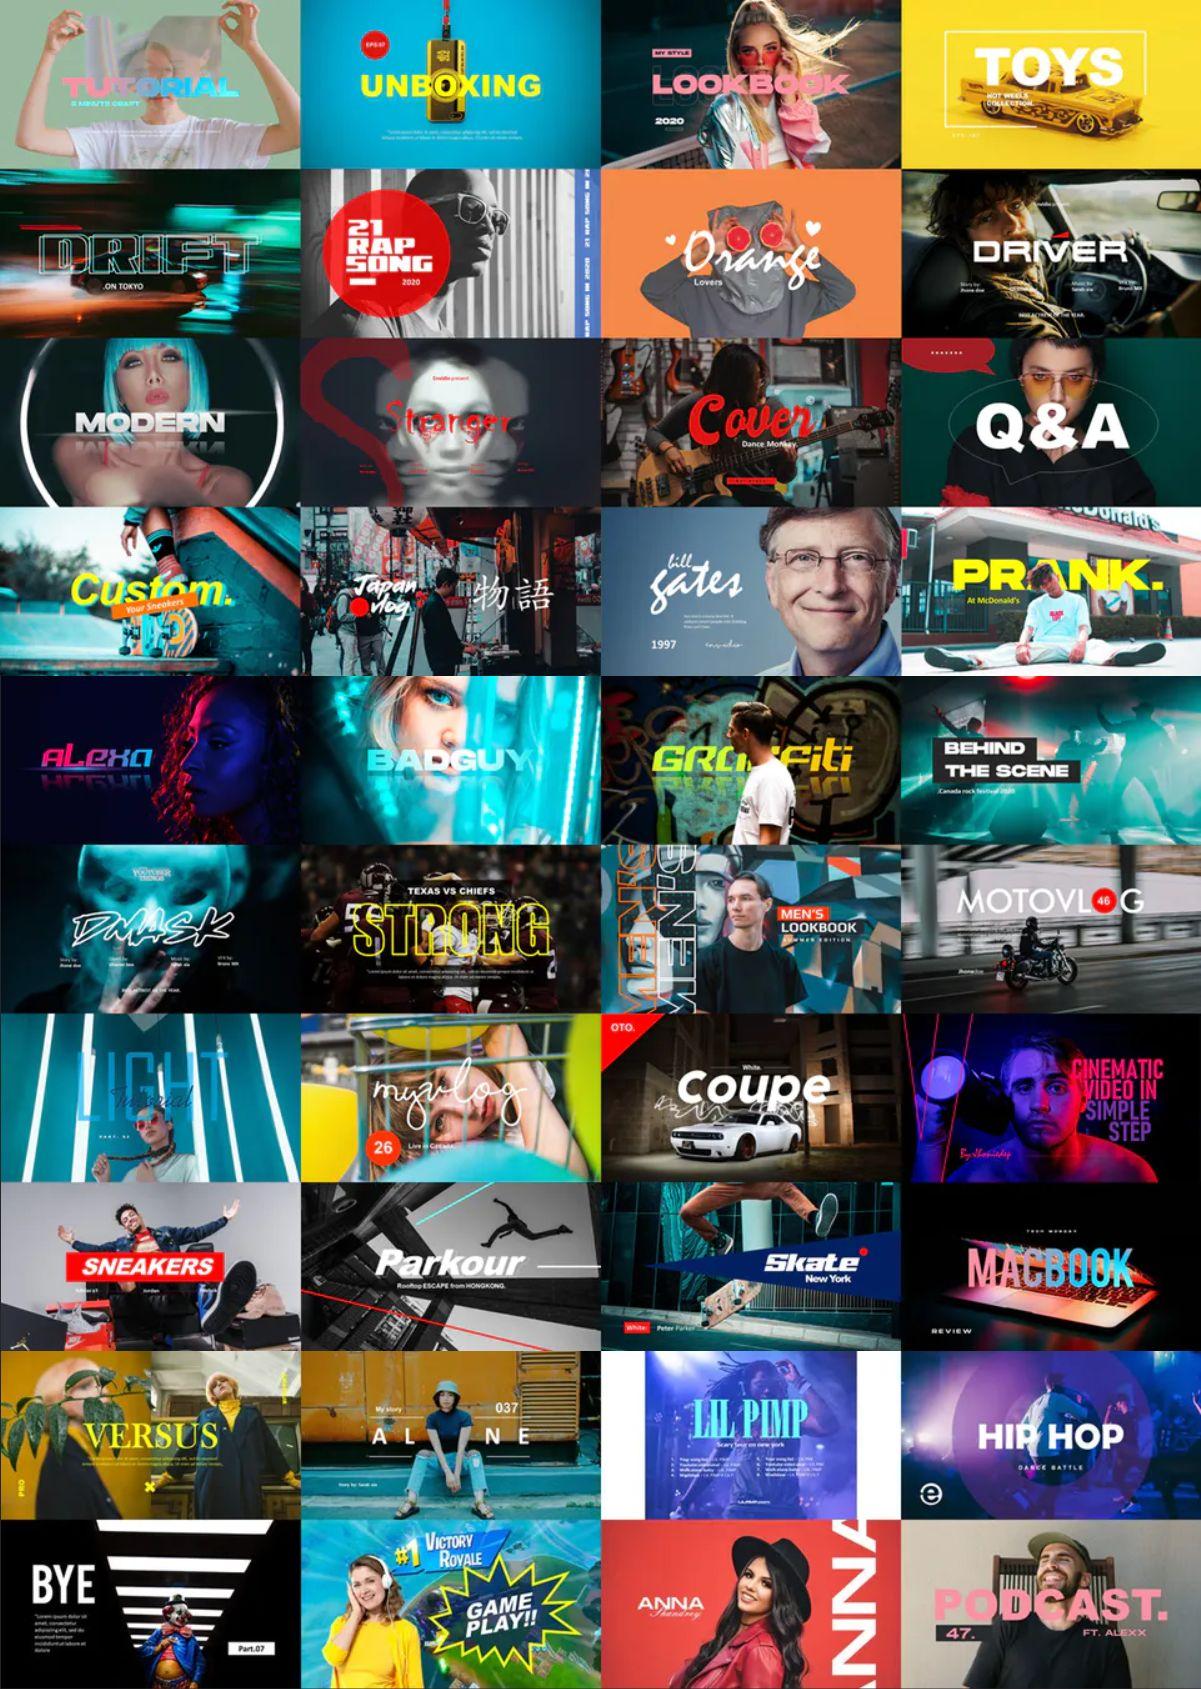 Envidio-2-0-YouTuber-Things-Review-Thumbnail